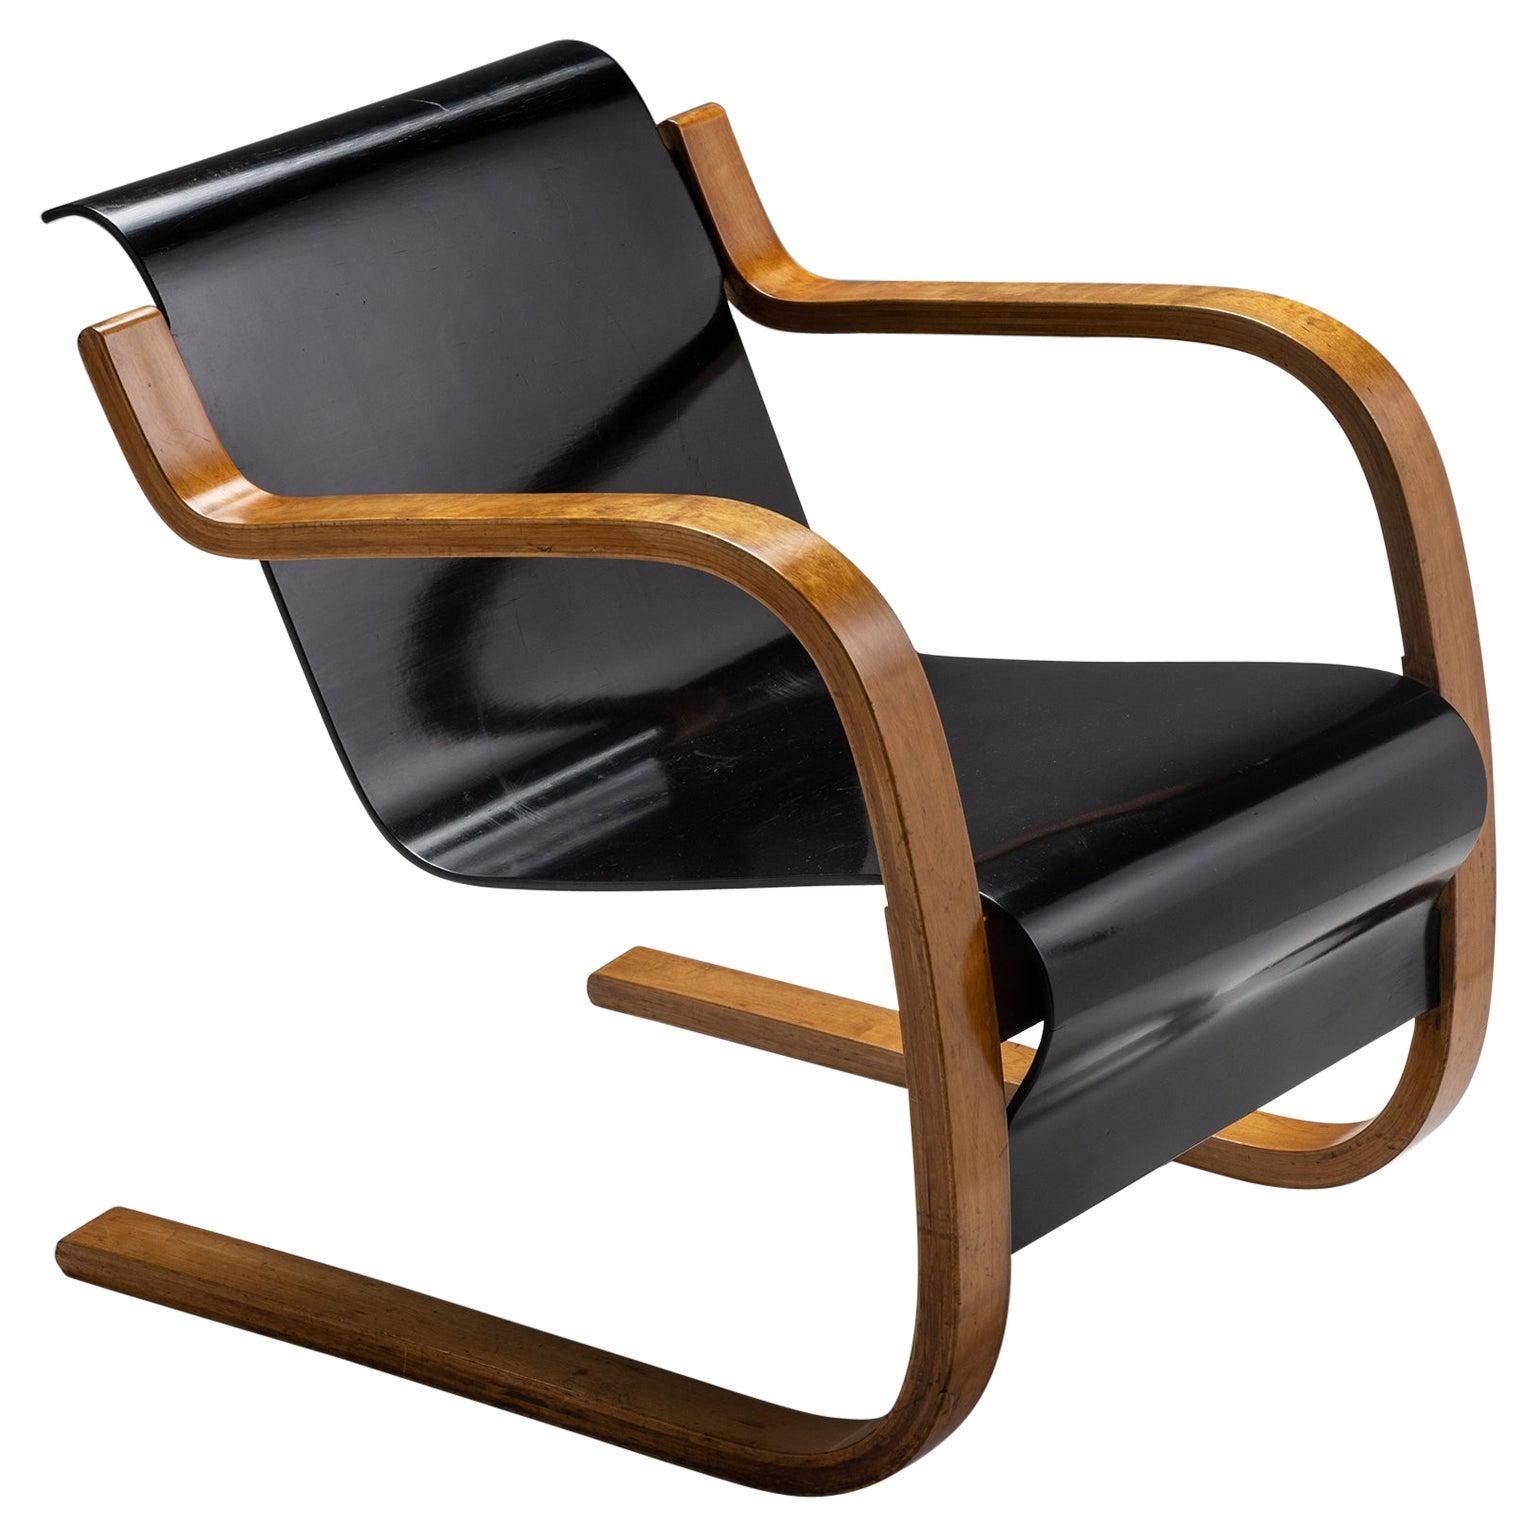 Alvar Aalto Lounge Chair Model 31/42, Finland, Circa 1935